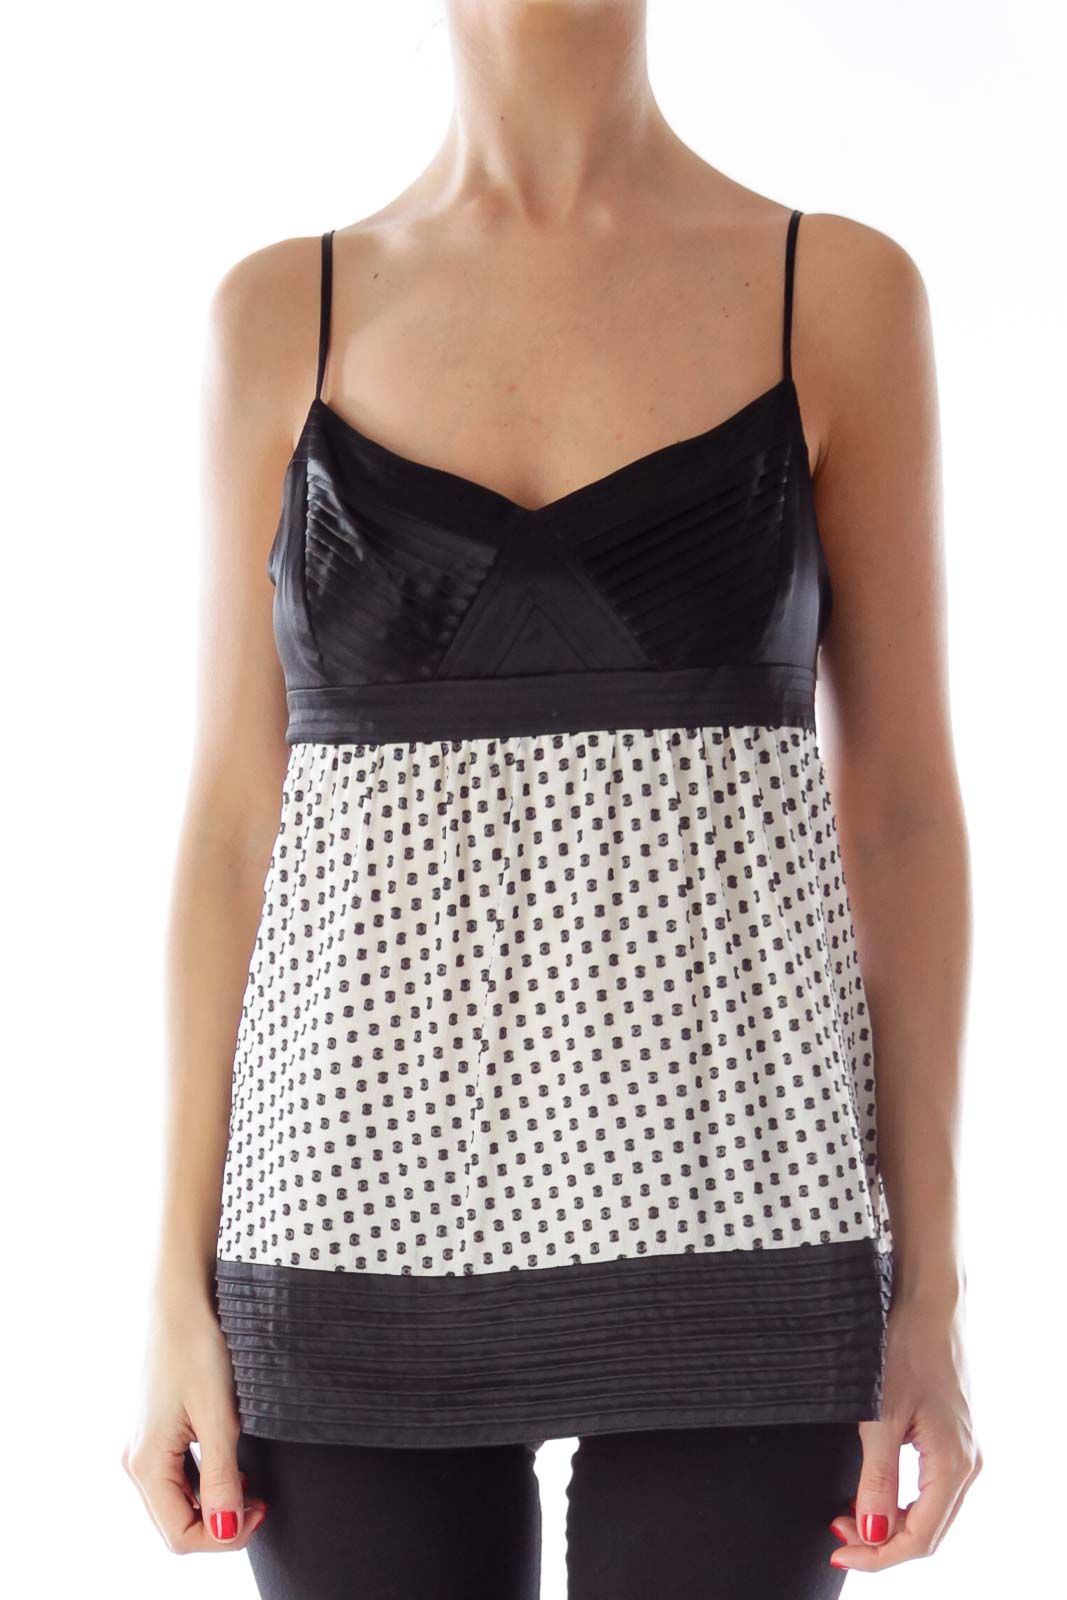 Like this BCBG MAXAZRIA? Shop this without using money! Trade. Shop. Discover. #fashionexchange #prelovedfashion  Black & White Polka Dot Cami Top by BCBG MAXAZRIA